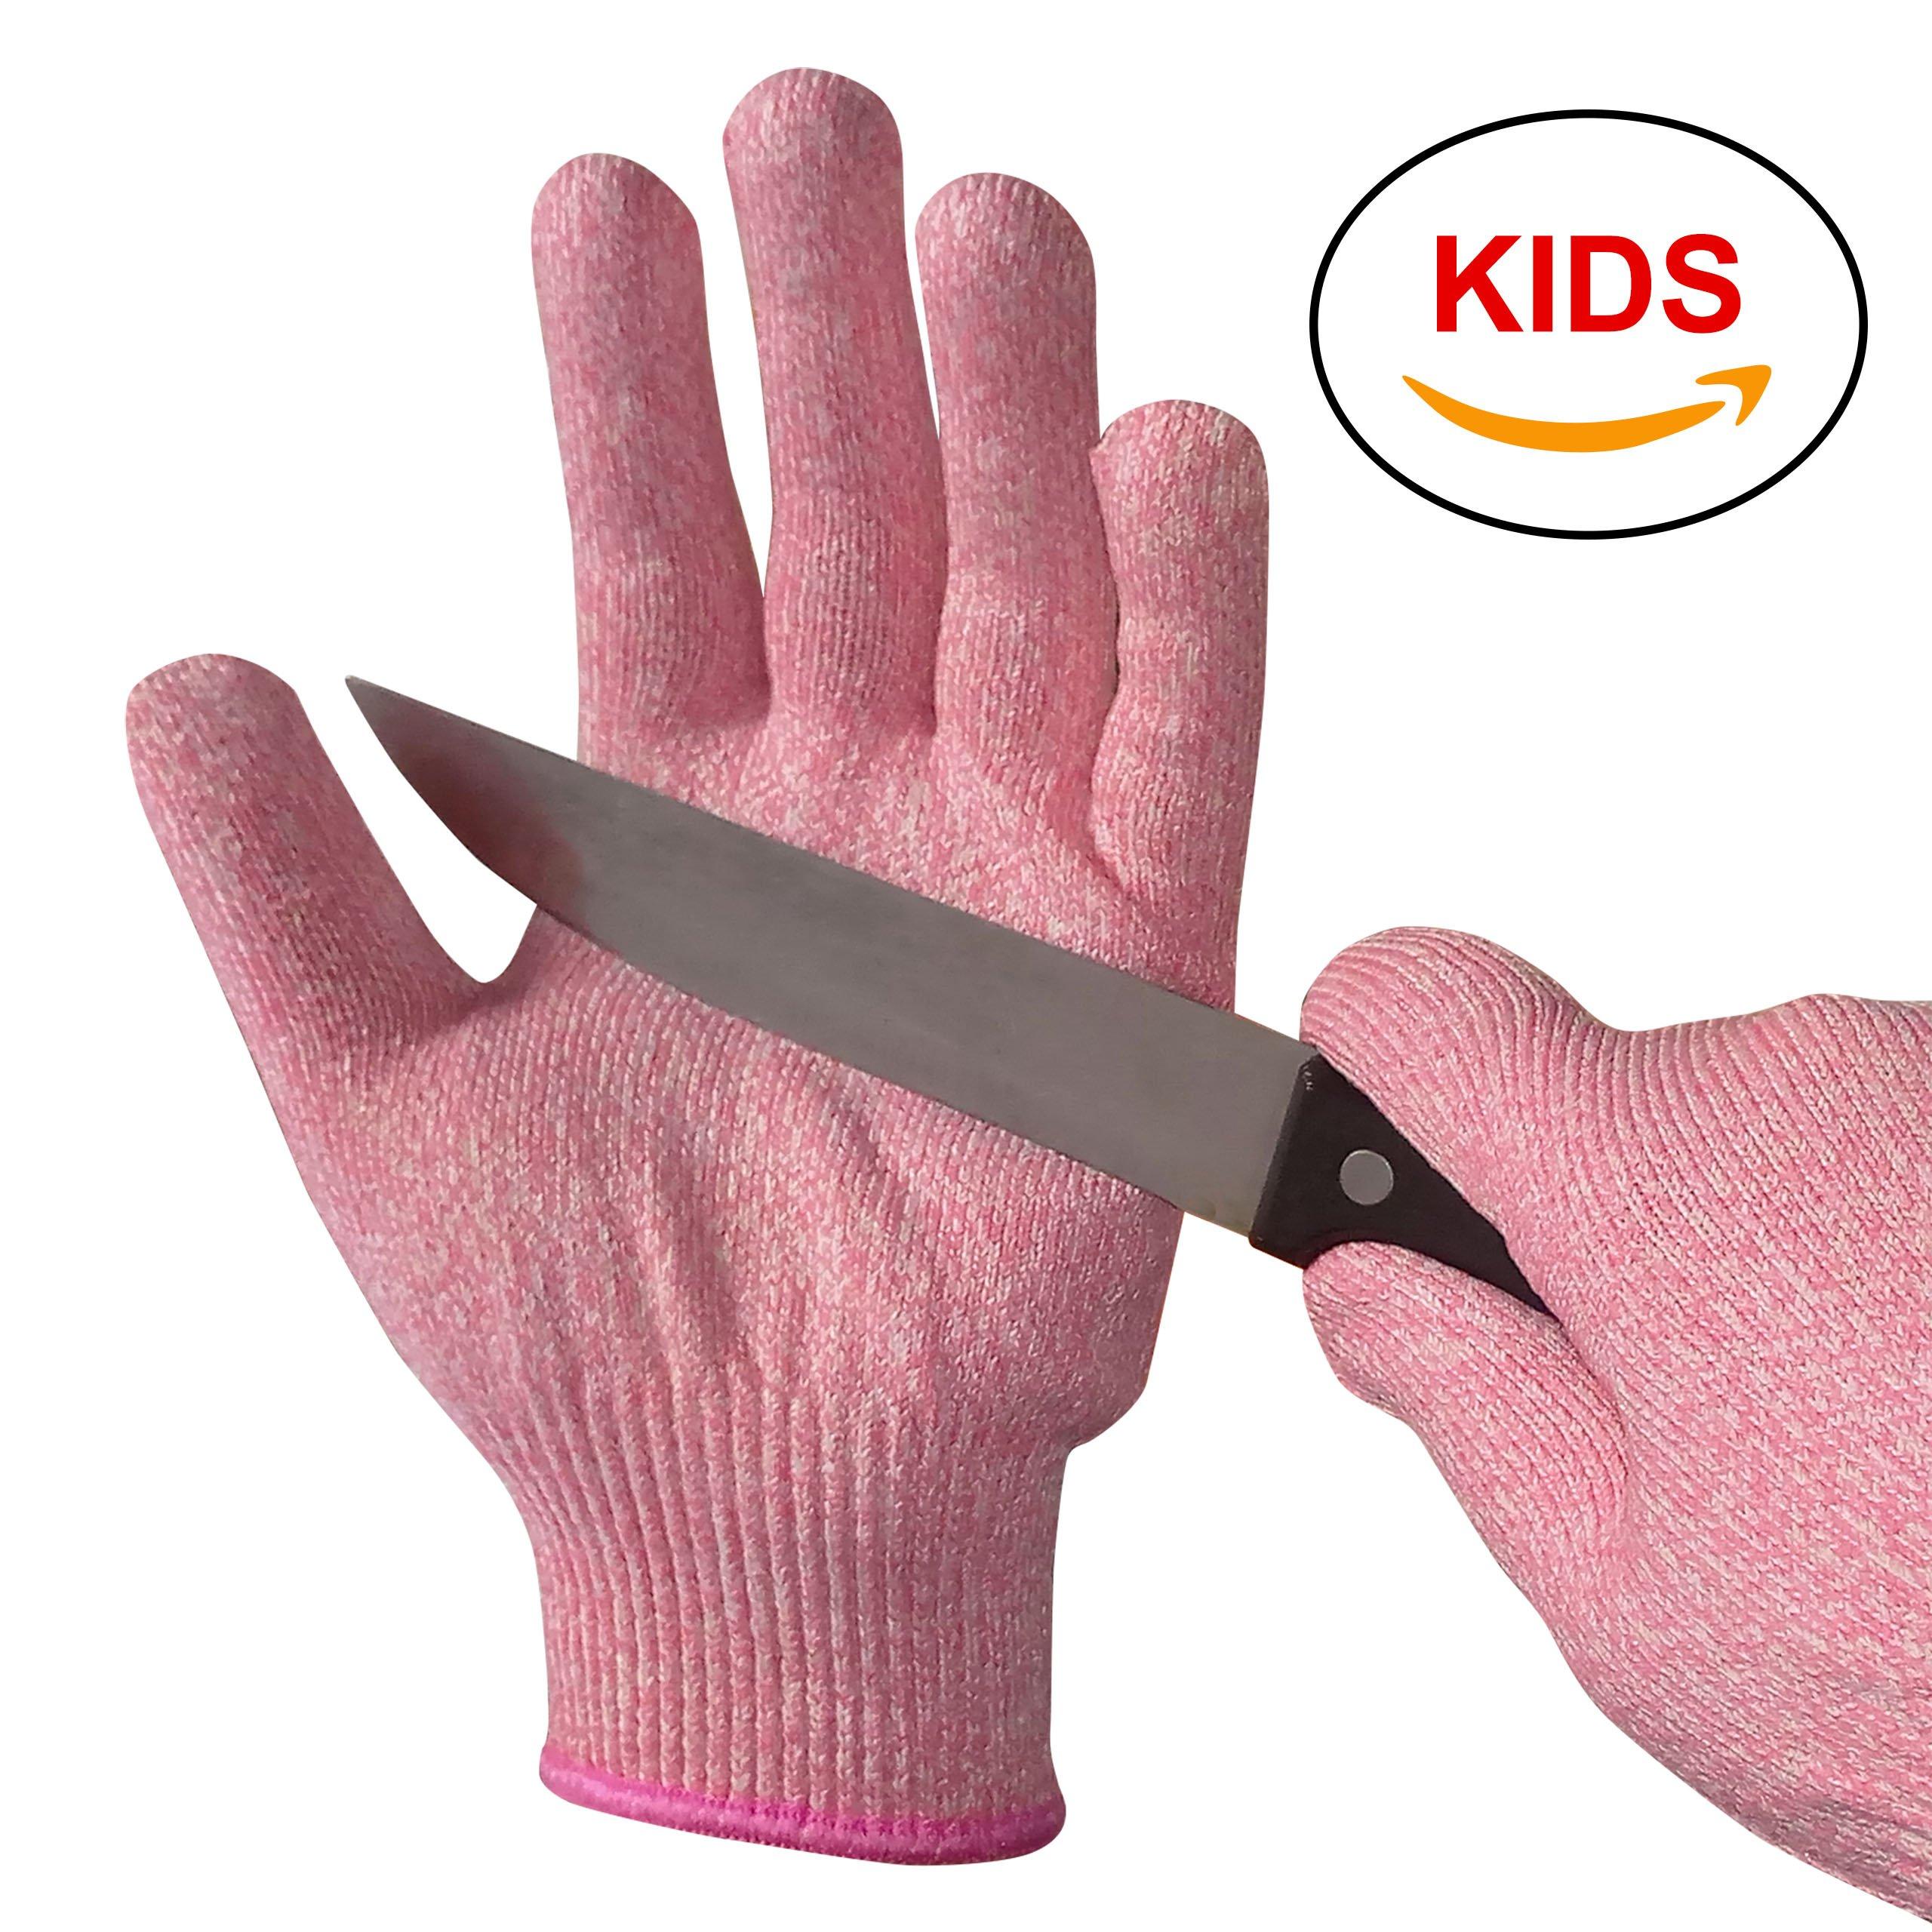 EVRIDWEAR Kid Sized Cut Resistant Work Gloves for Kitchen Use, Crafts, DIY,  Garden and Yard works. Children Food Grade Kevlar Safety Gloves for Hand ...